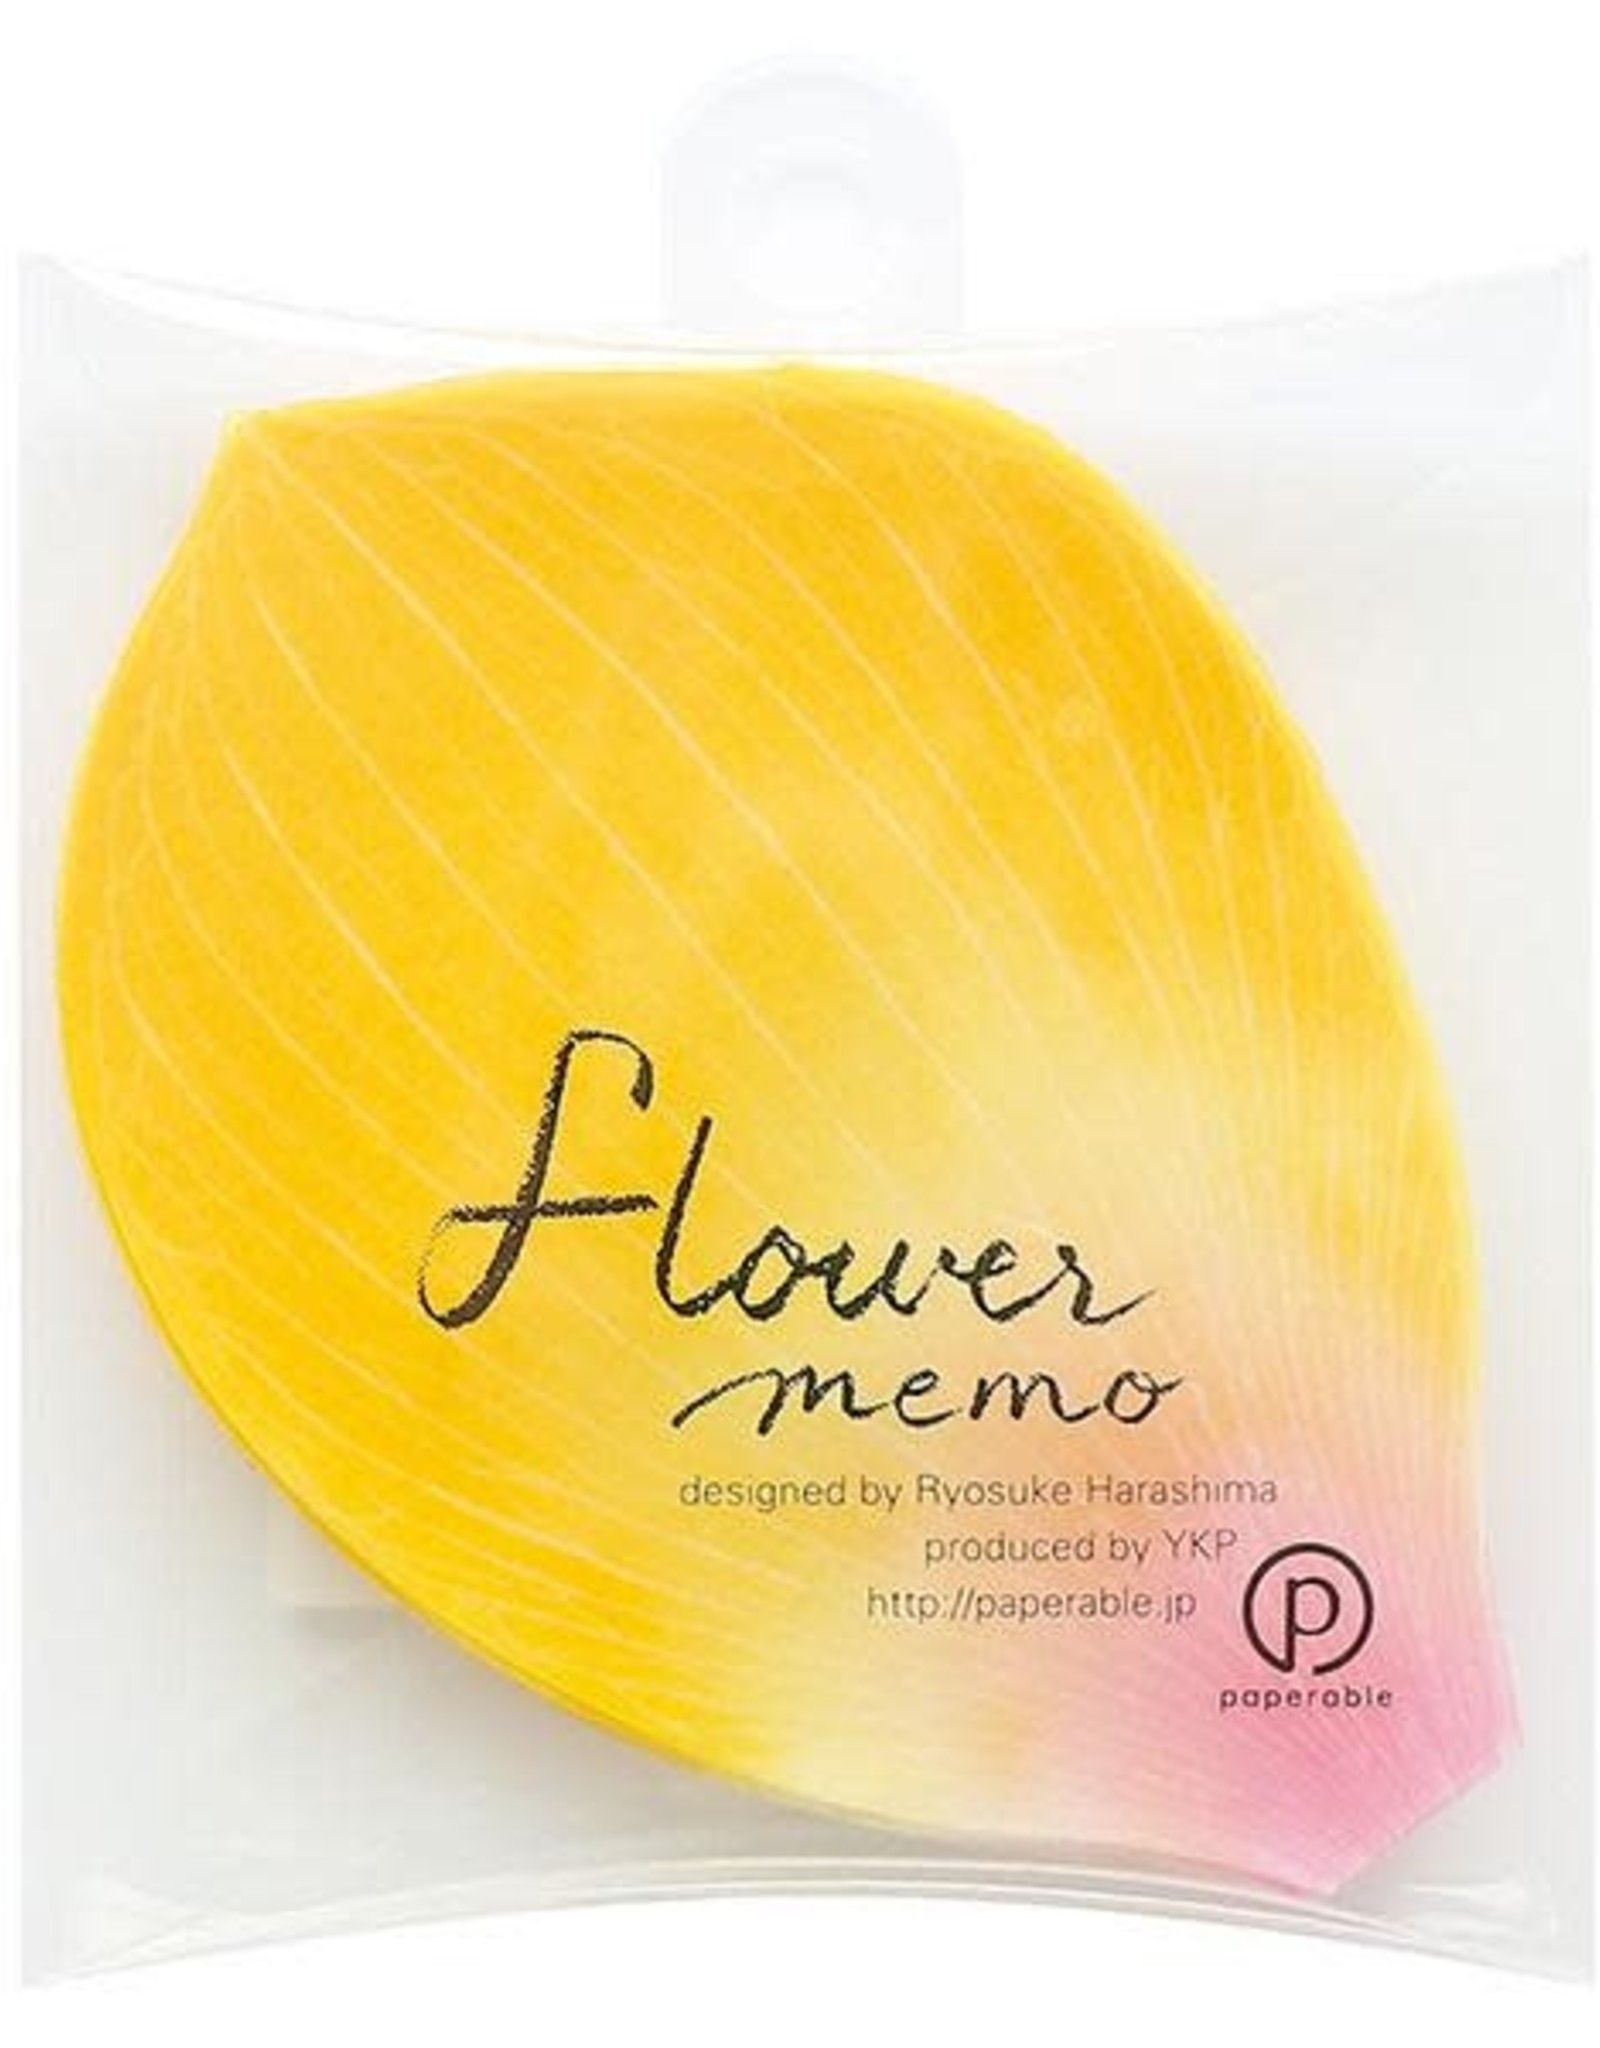 Paperable Paperable Petal Memos